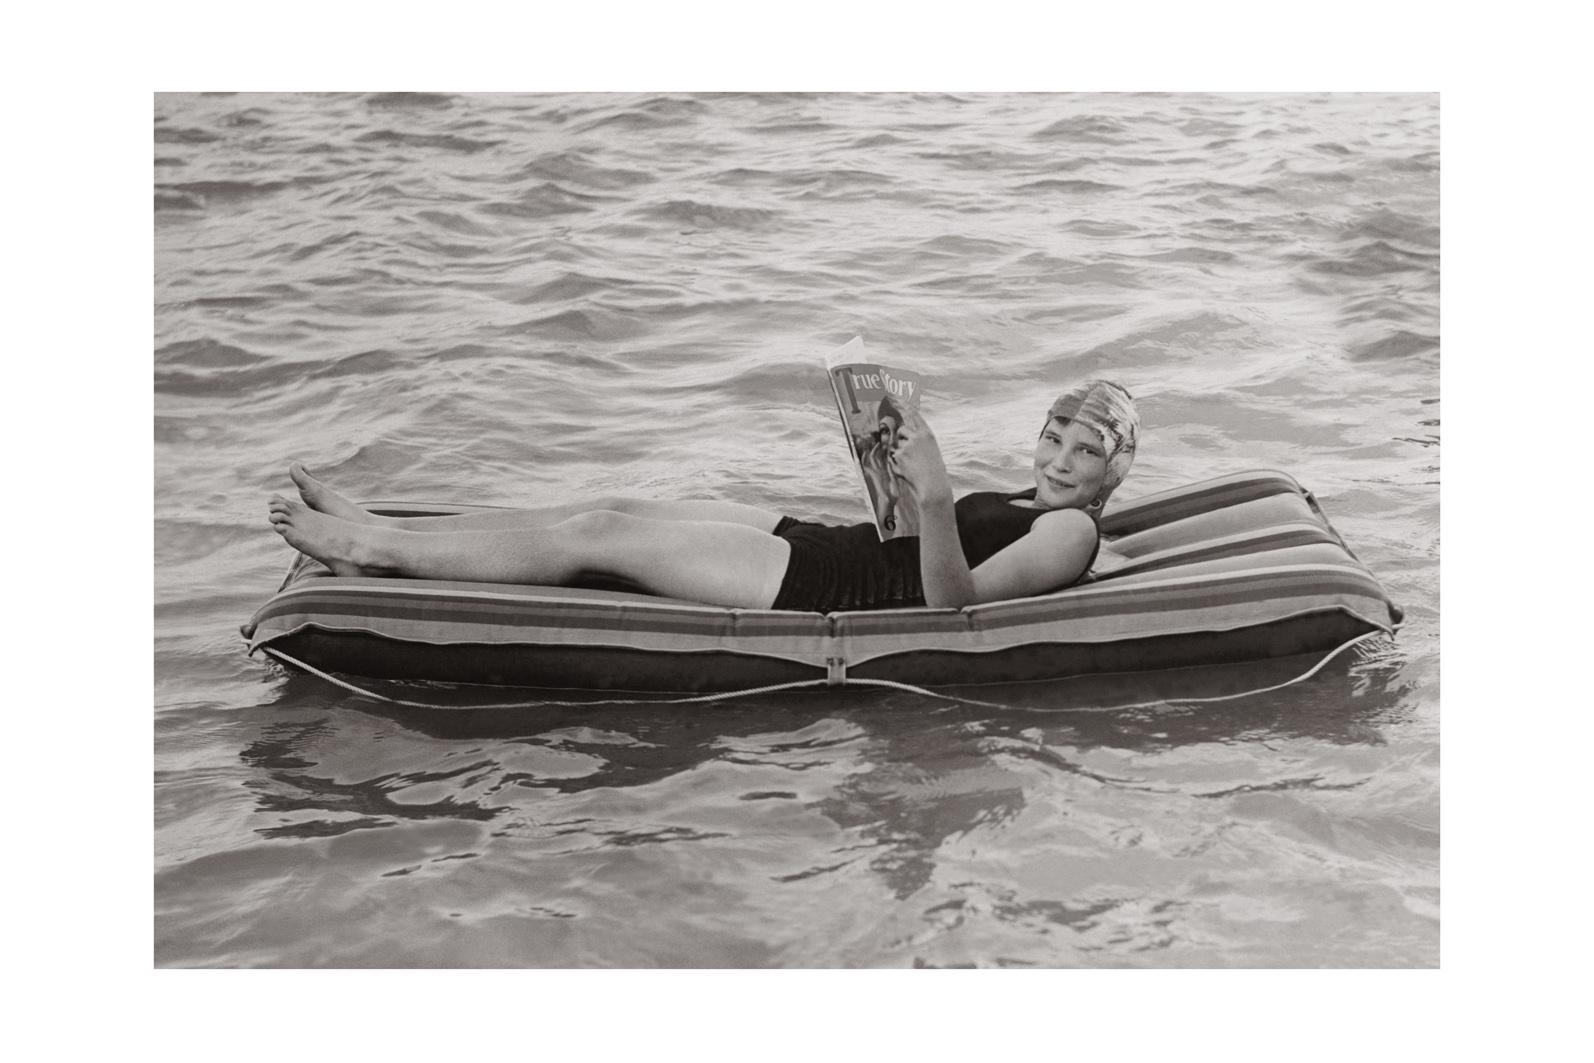 Photo ancienne noir et blanc mer n°79 alu 70x105cm